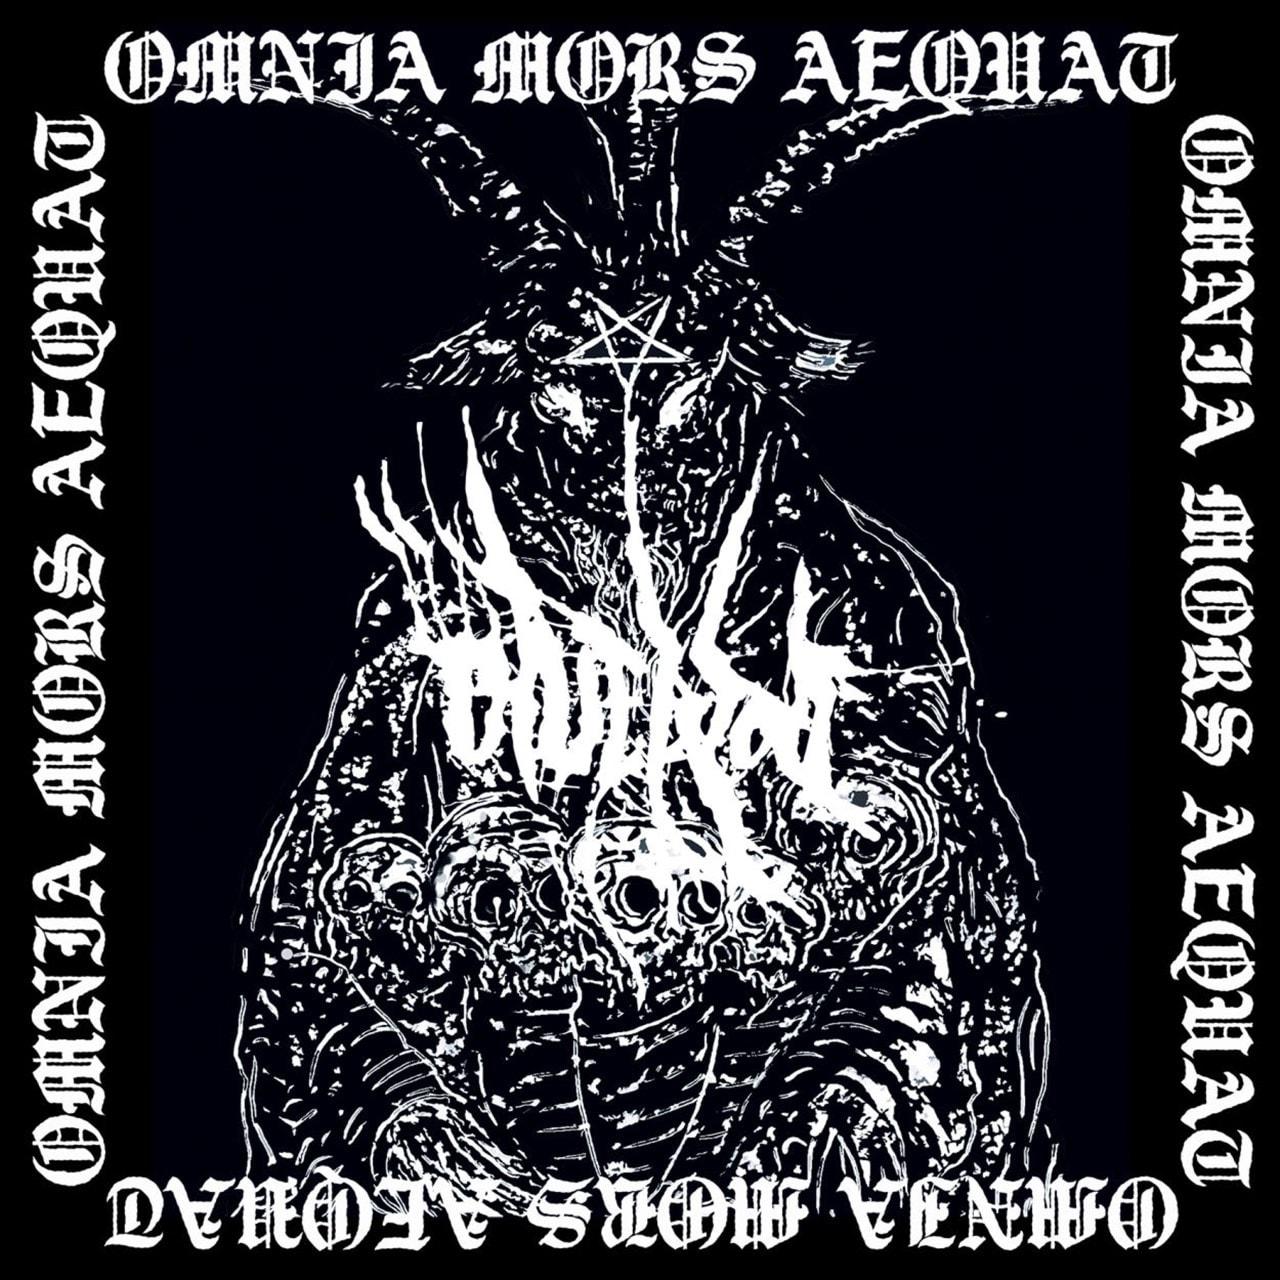 Omnia Mors Aequat - 1